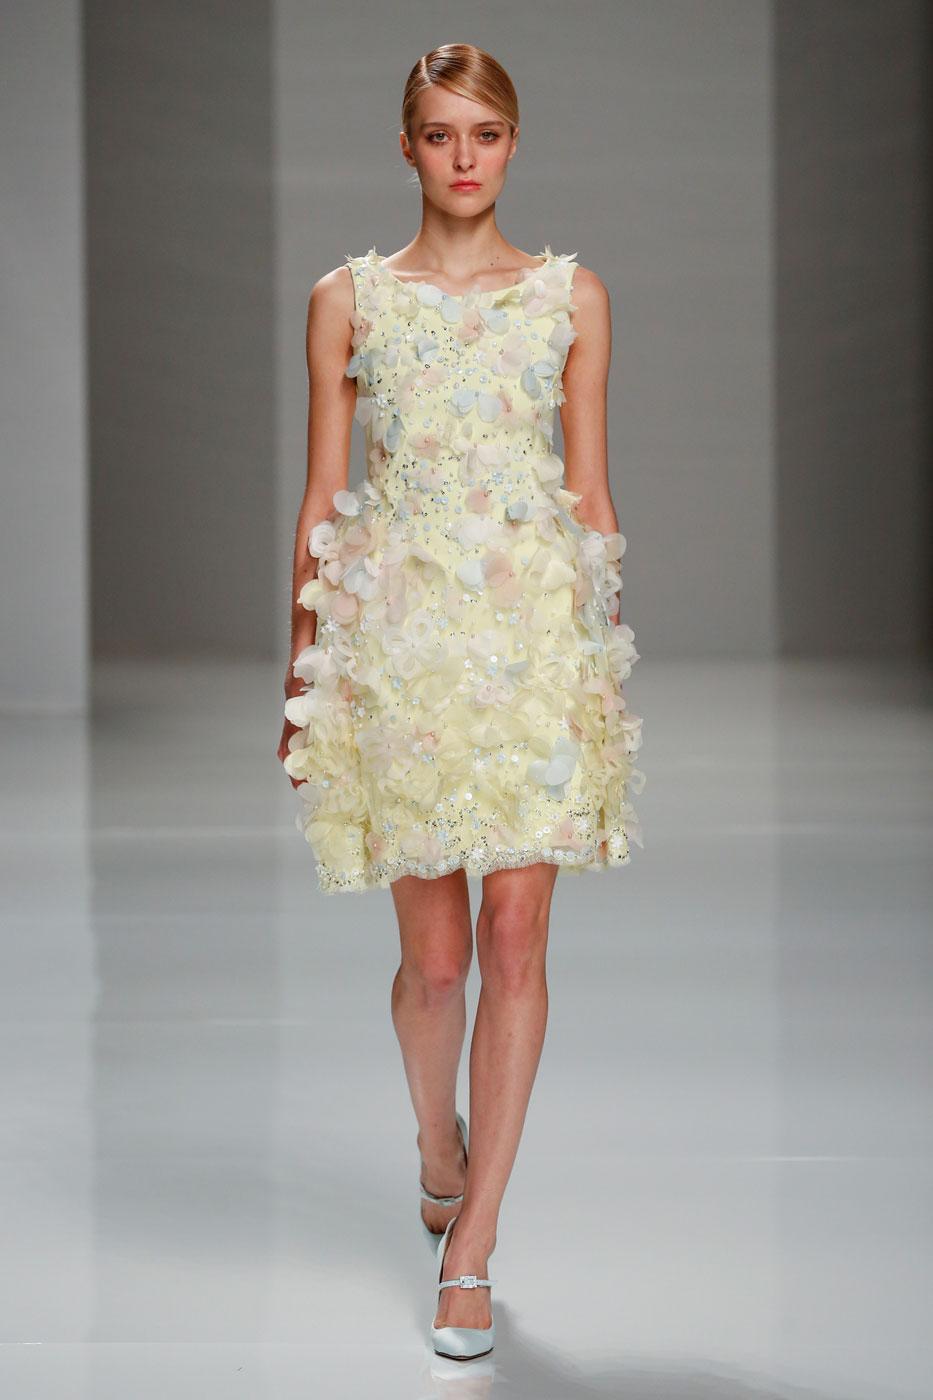 Georges-Hobeika-fashion-runway-show-haute-couture-paris-spring-2015-the-impression-79